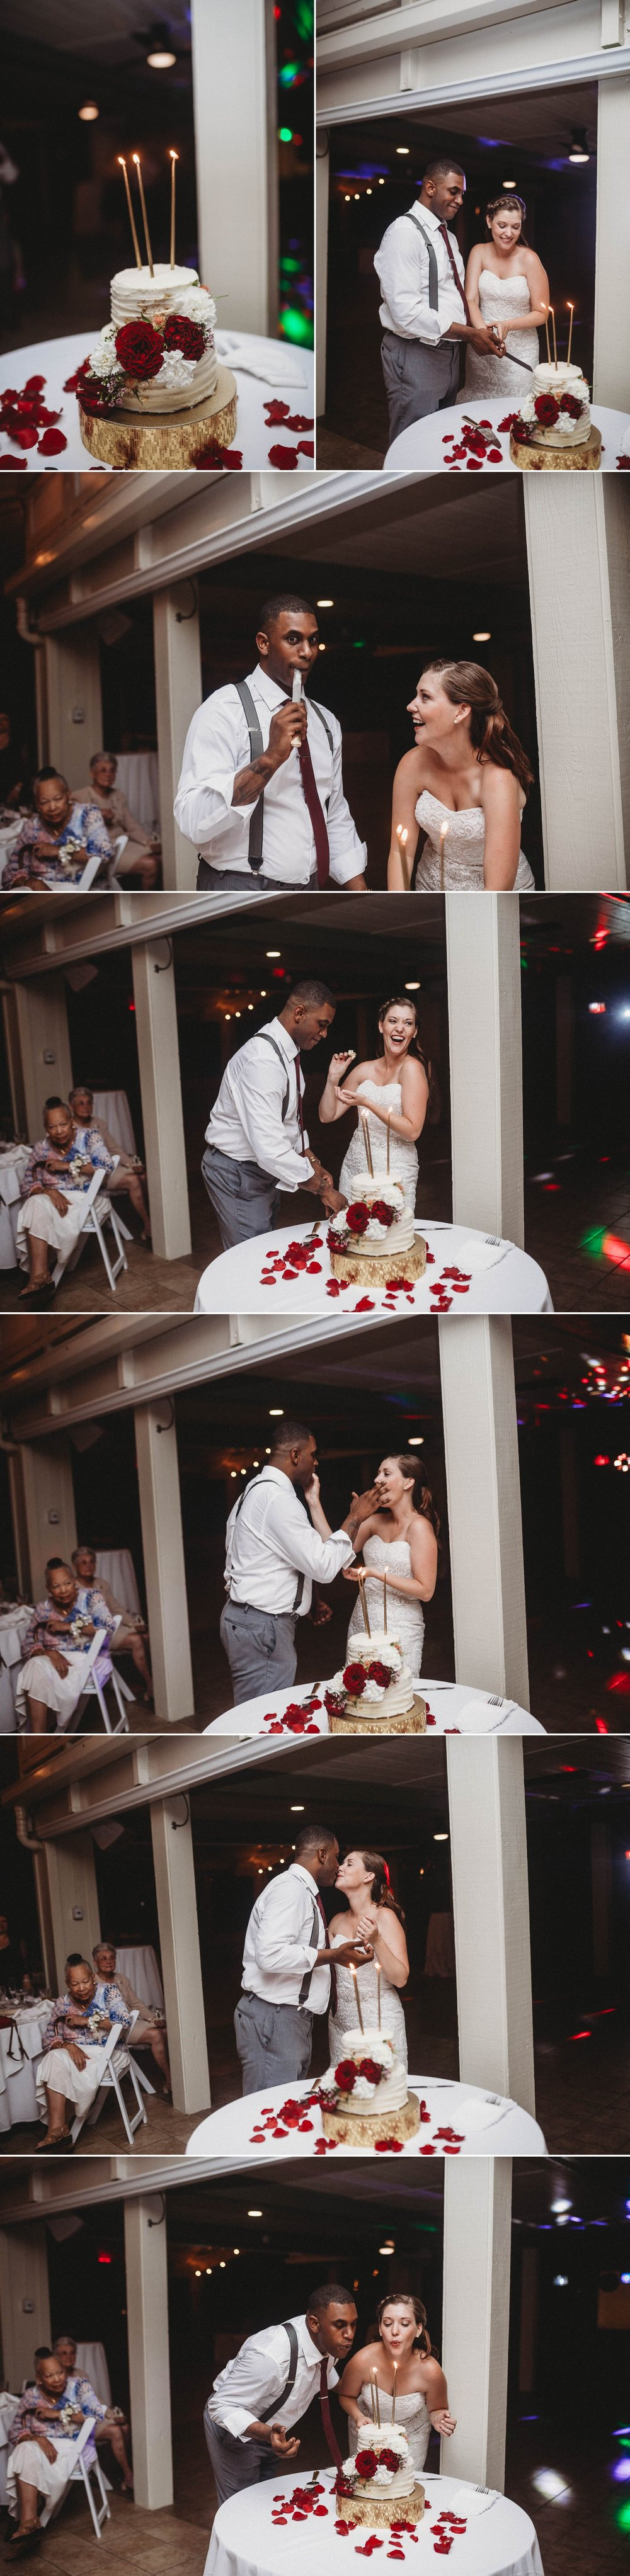 Cutting of the Wedding Cake - Rachel + Jamison - Rumbling Bald Resort, Lake Lure, NC - Asheville, North Carolina Wedding Photographer